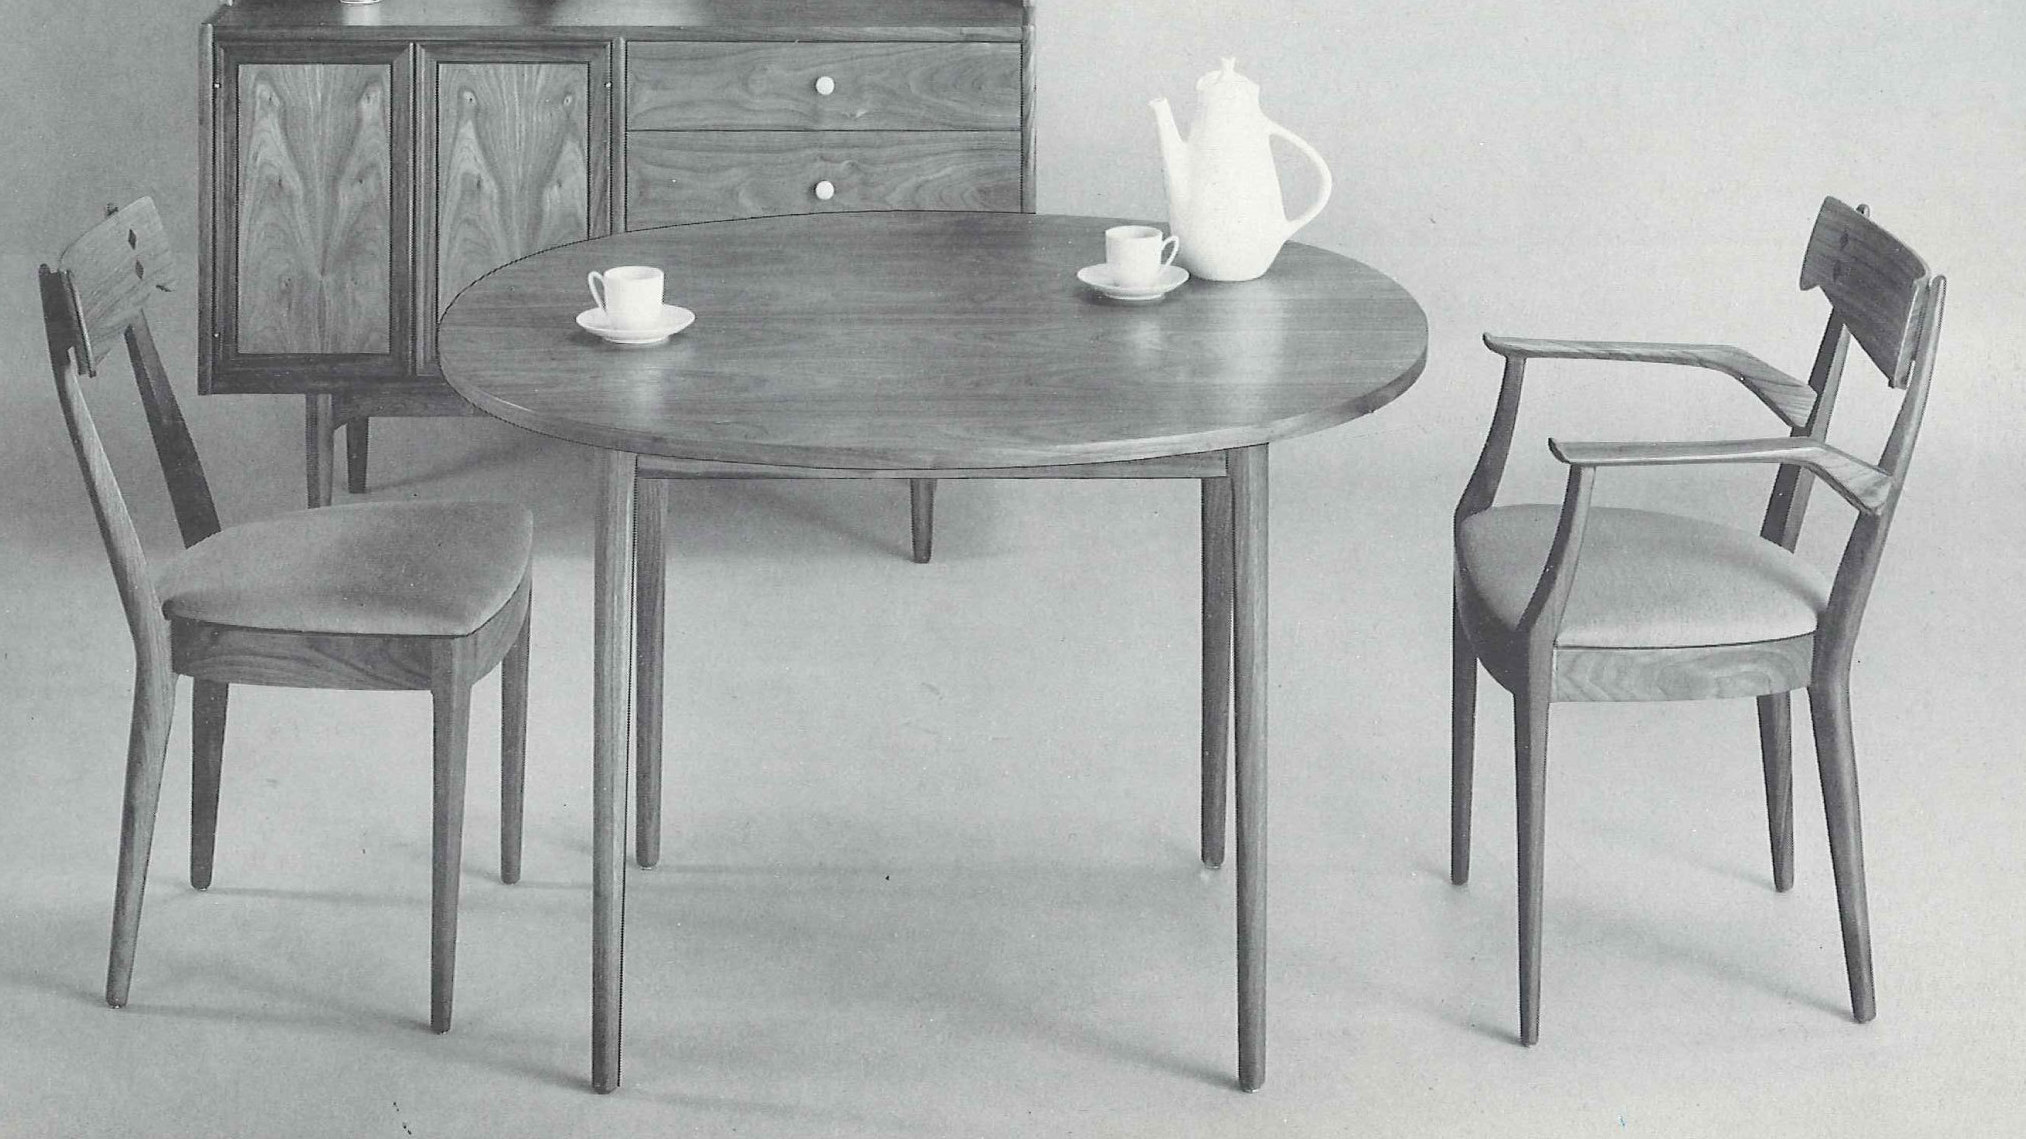 Gentil Midcentury Furniture + Grandkid Nostalgia U003d Modern Trend : NPR